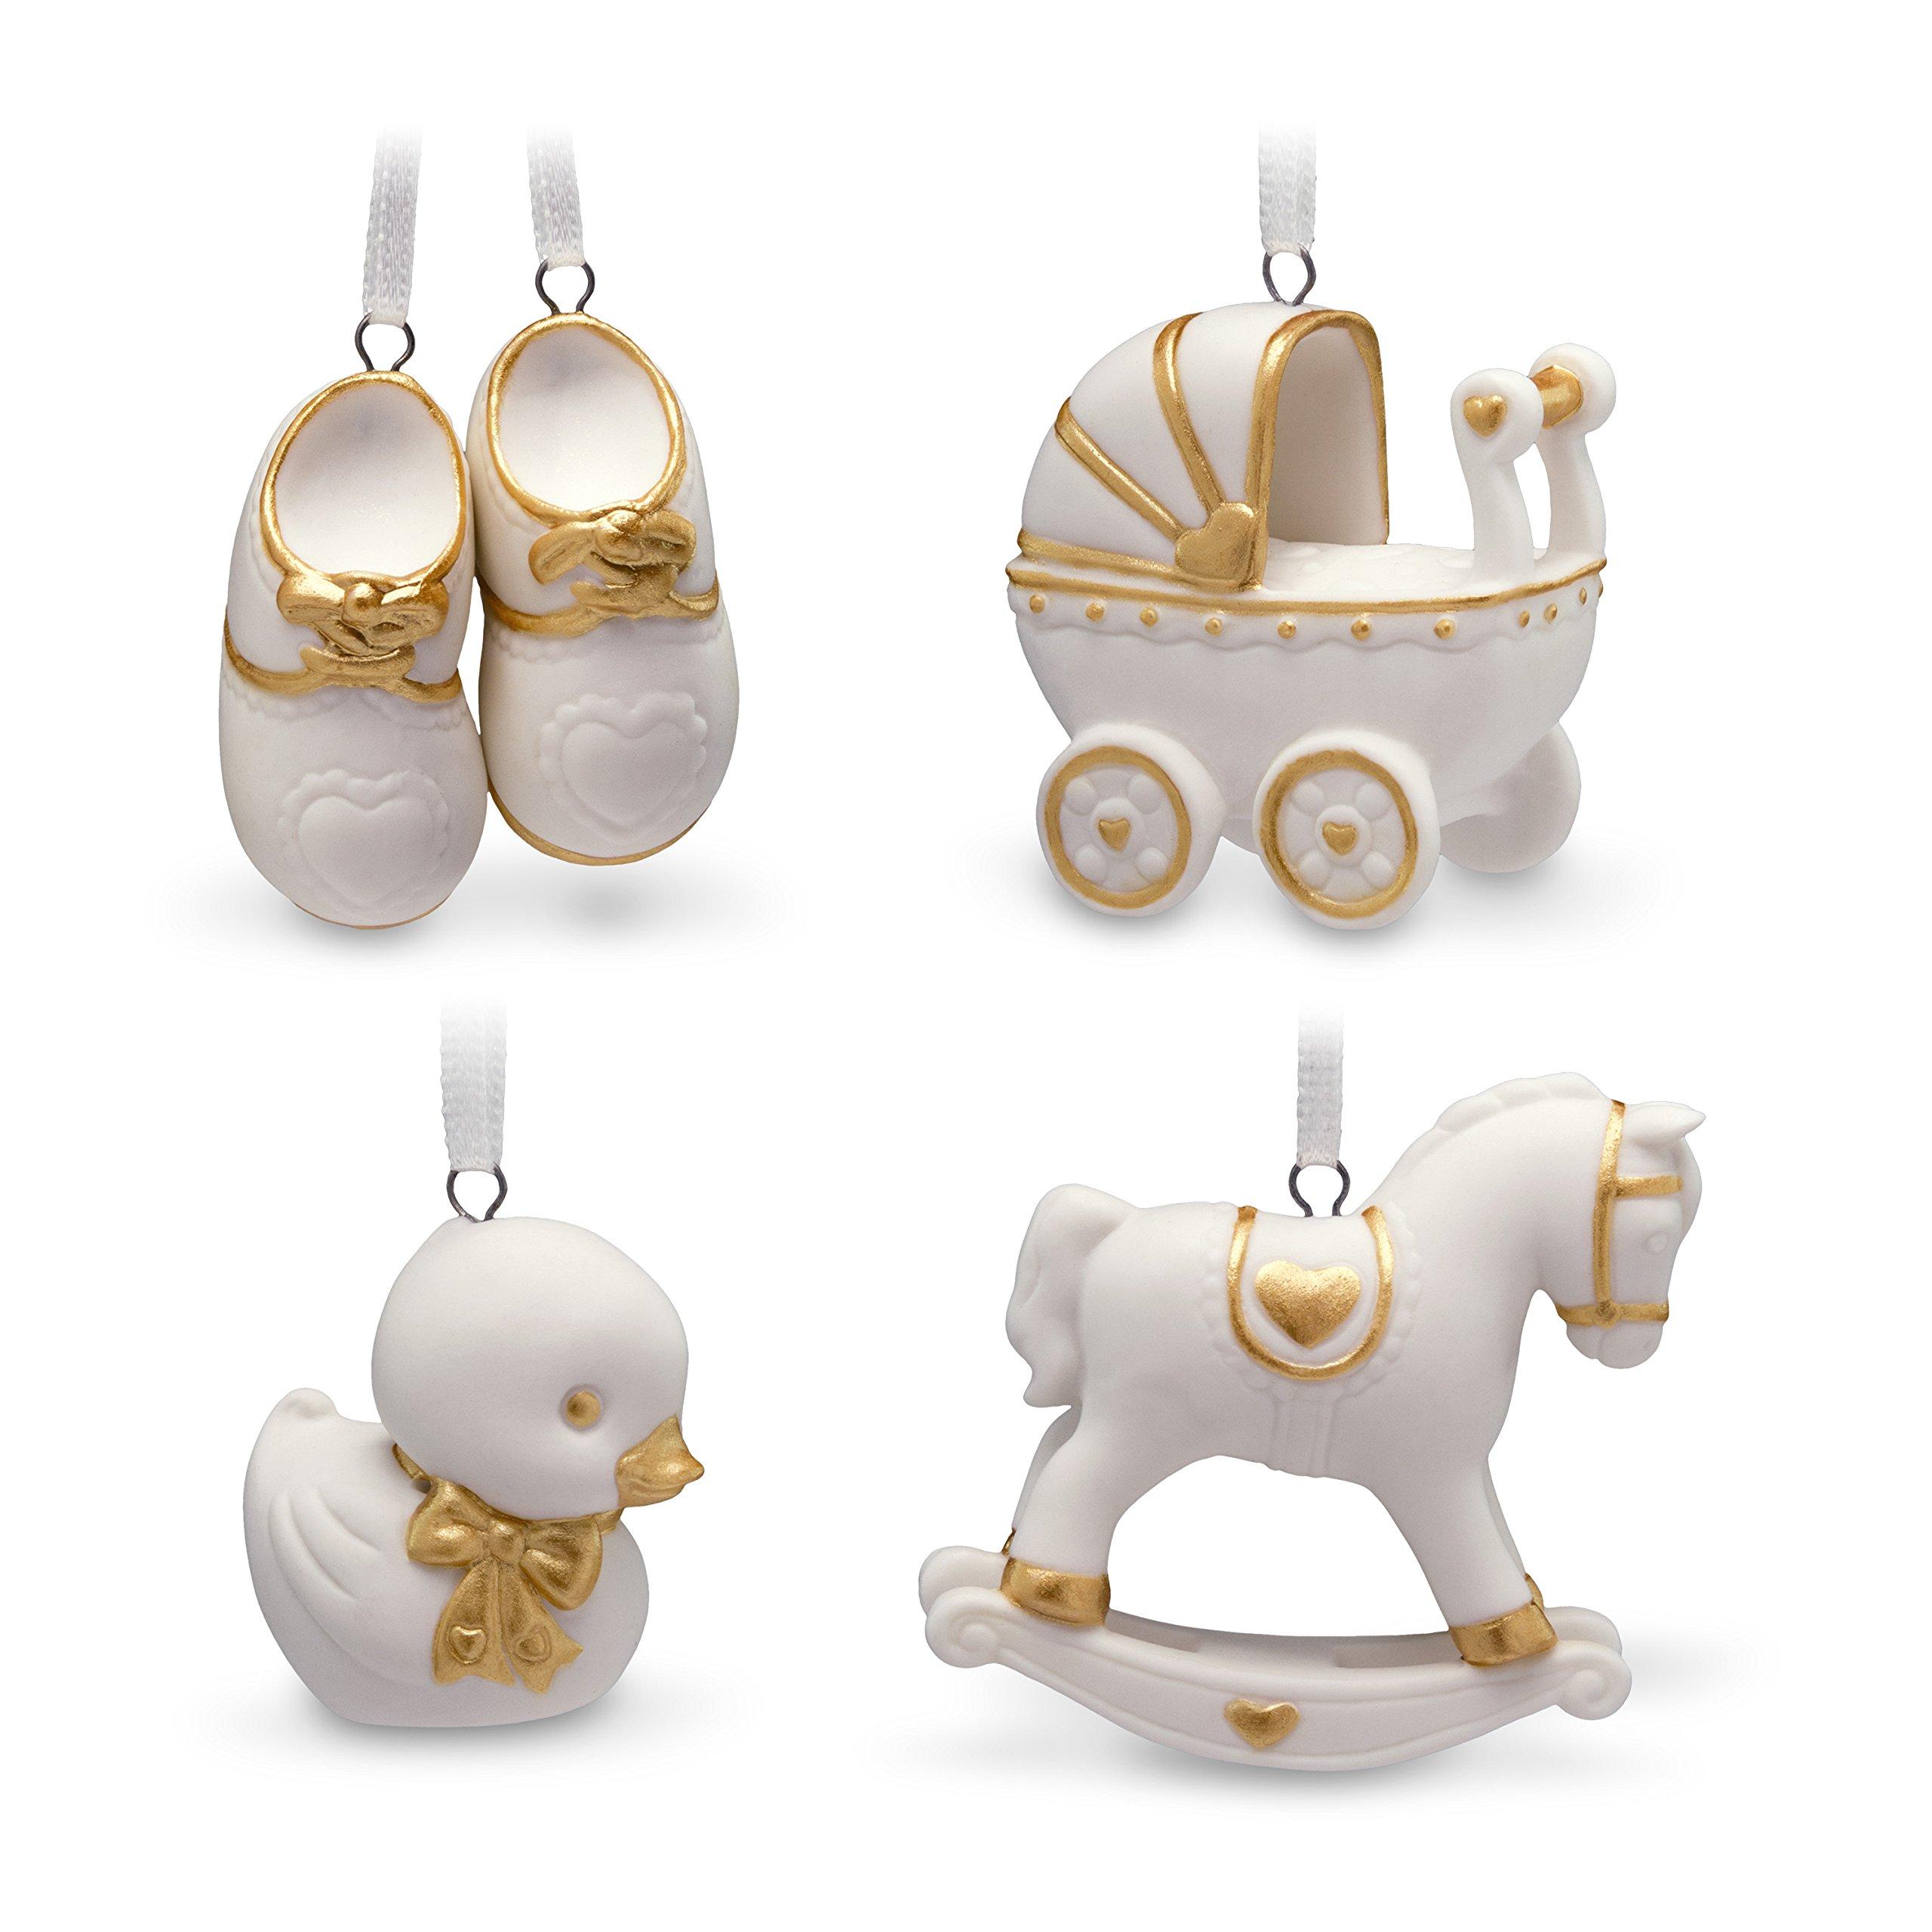 Hallmark Keepsake Mini Christmas Ornaments 2018 Year Dated, Welcome Baby Miniature, Set of 4 Porcelain